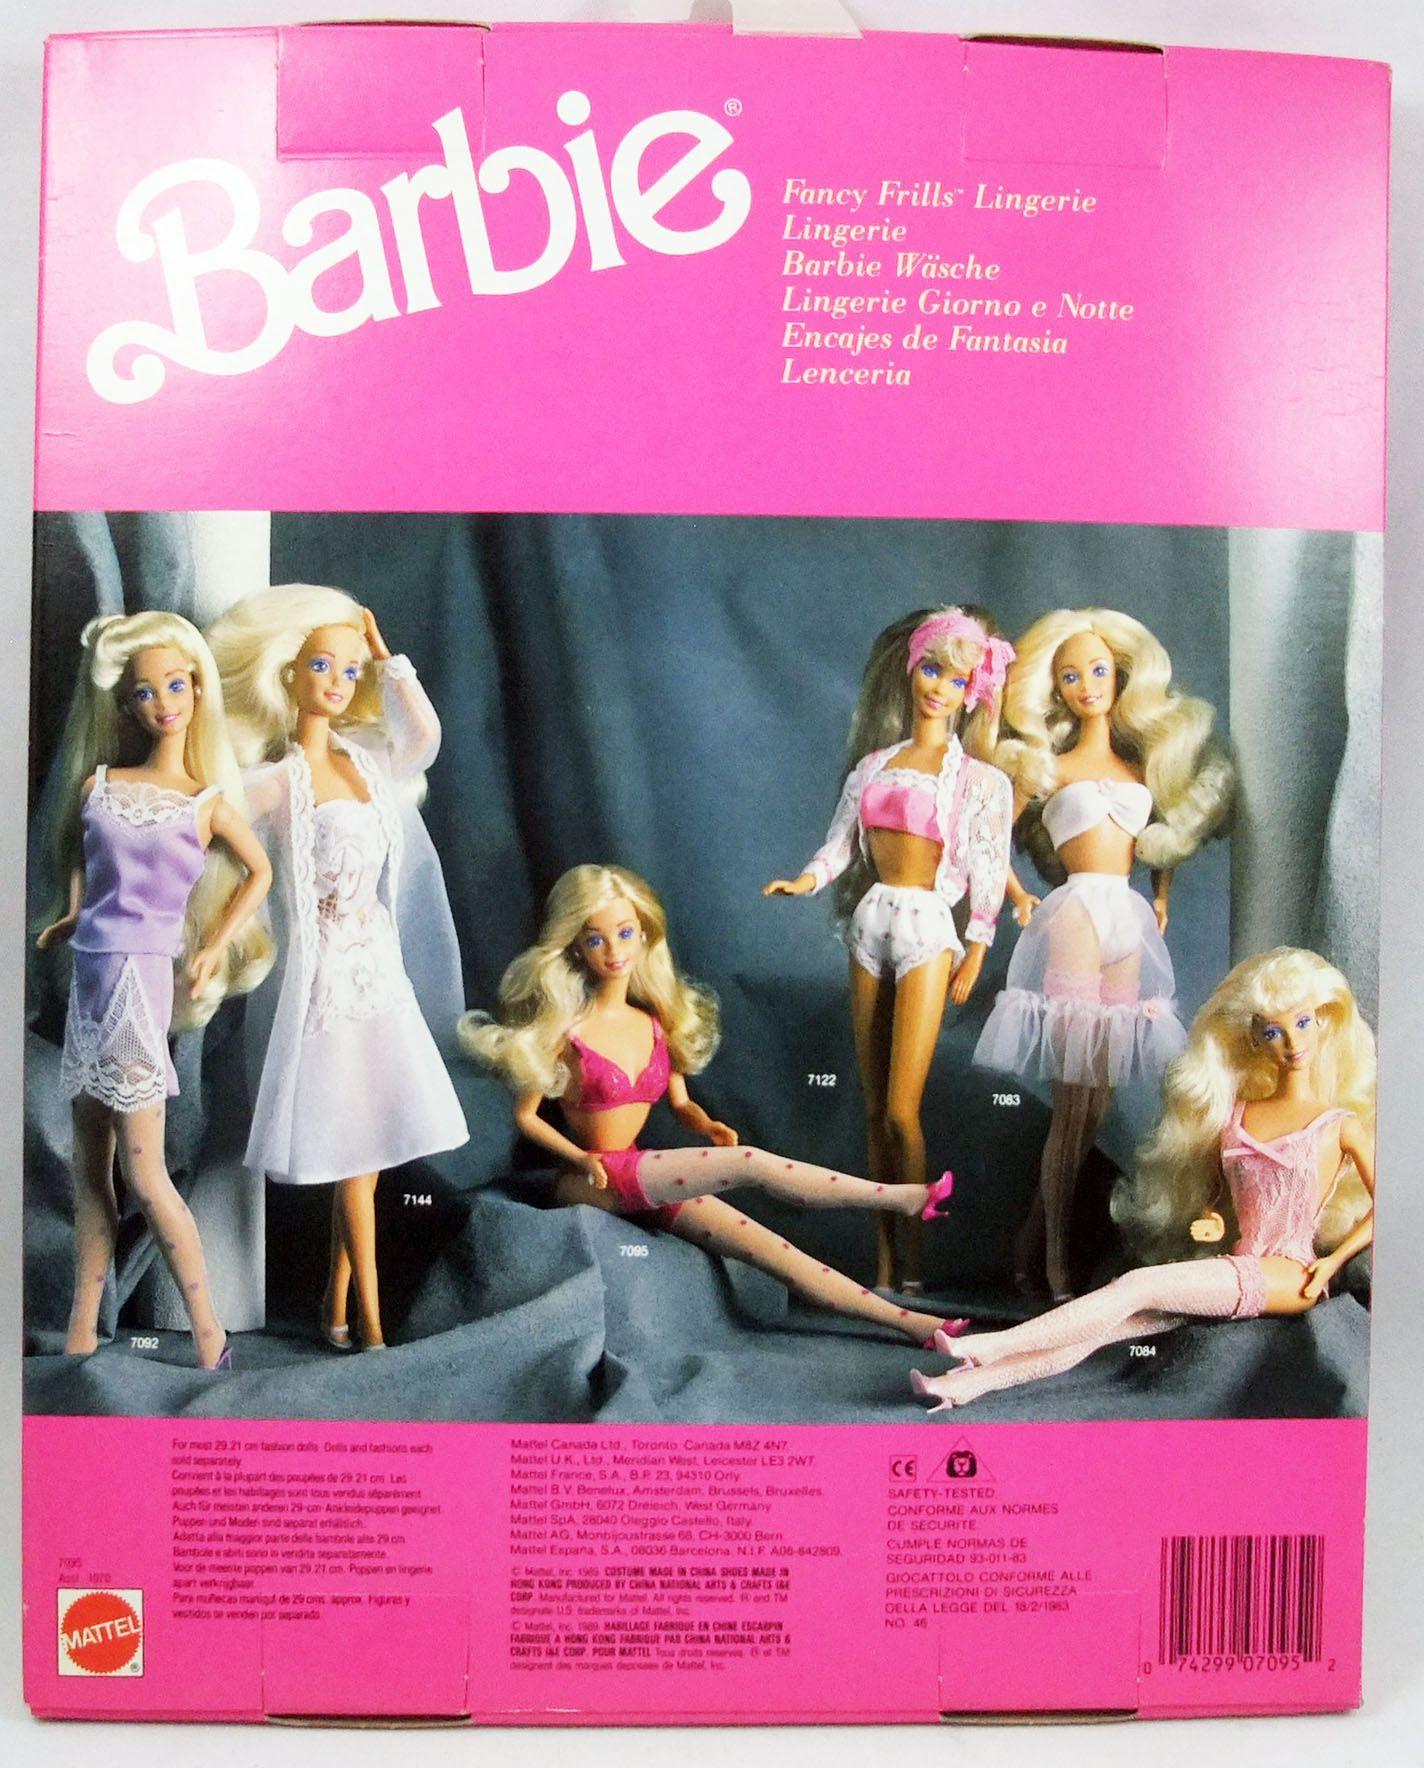 Barbie - Fancy Frills Lingerie - Mattel 1989 (ref.7095)